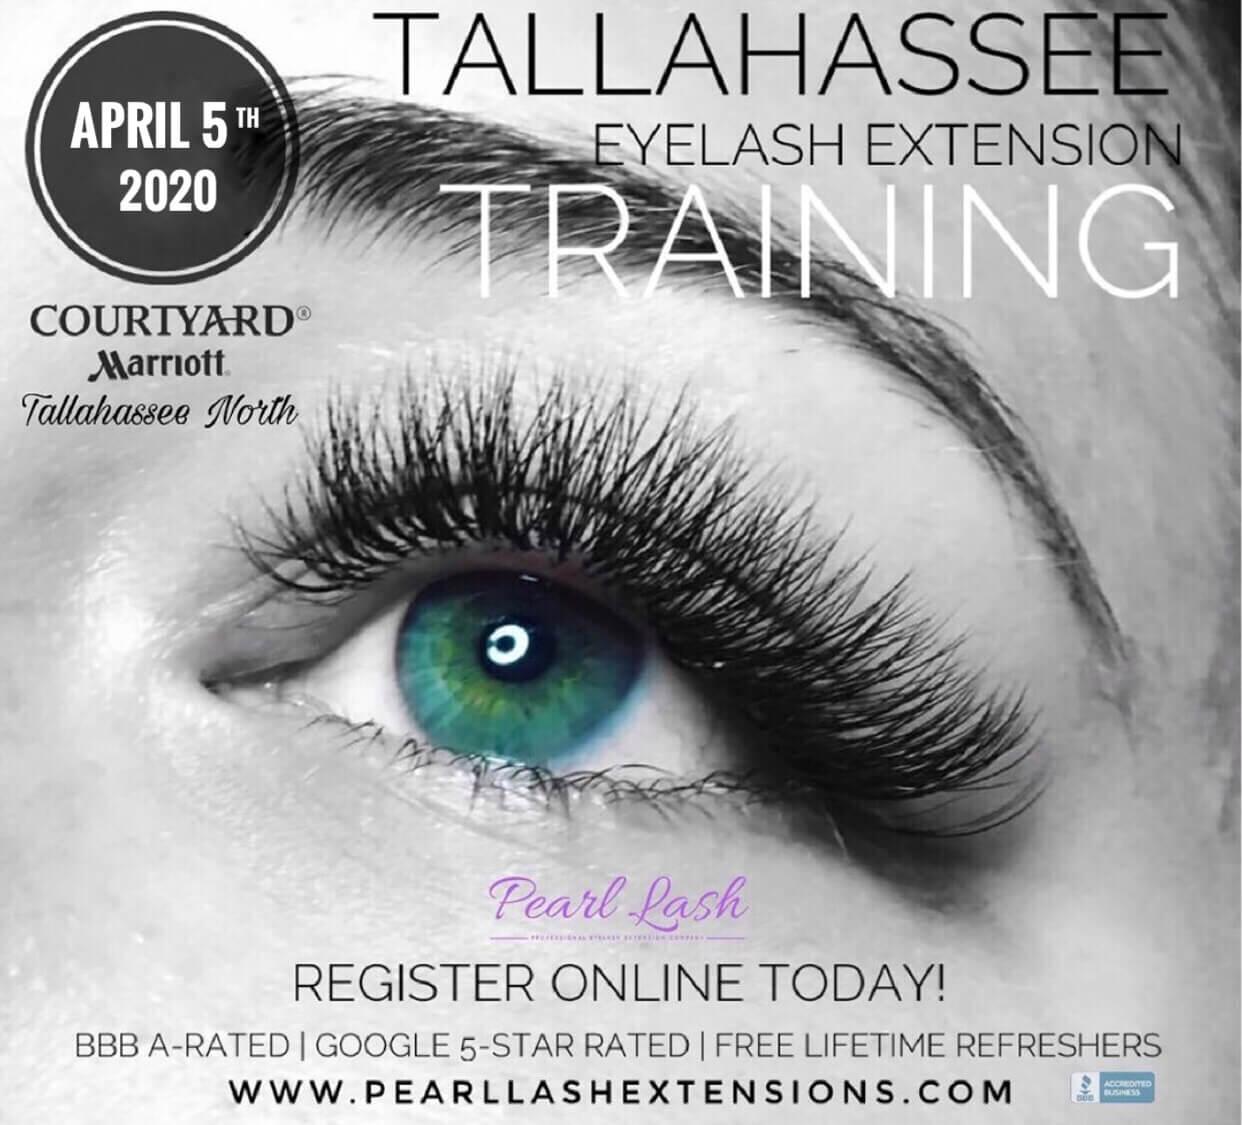 Eyelash Extension Training Tallahassee Pearl Lash